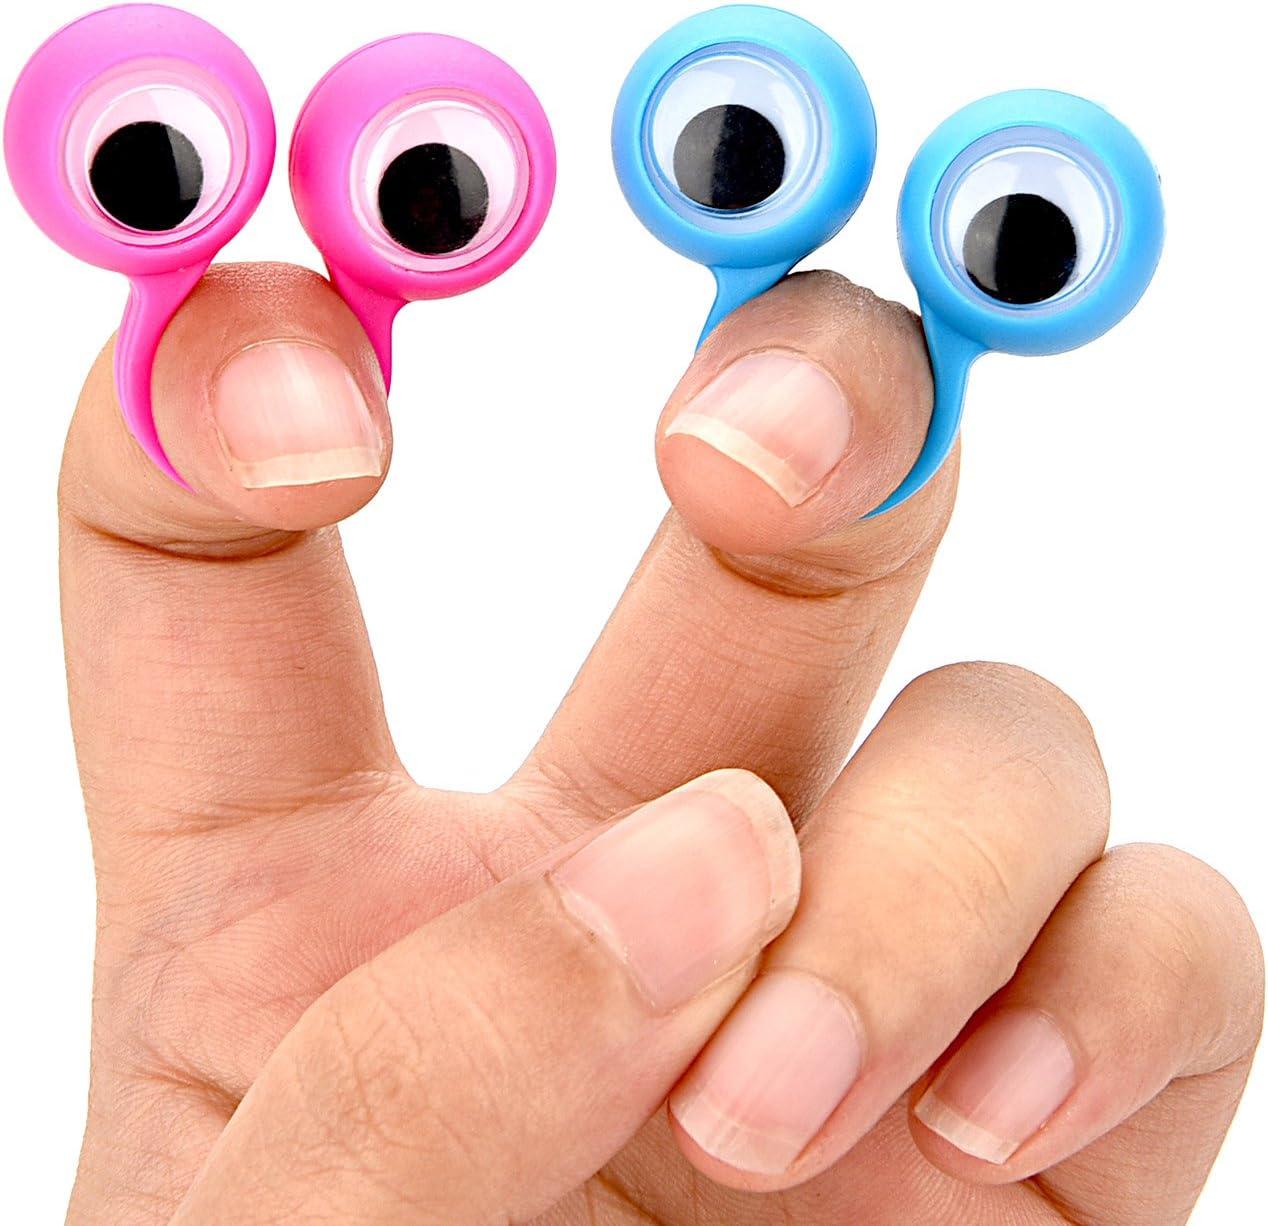 SUPVOX 20pcs Eyes Finger Ring Eyeball Finger Toy Googly Finger Puppets Party Favor Toys Random Color